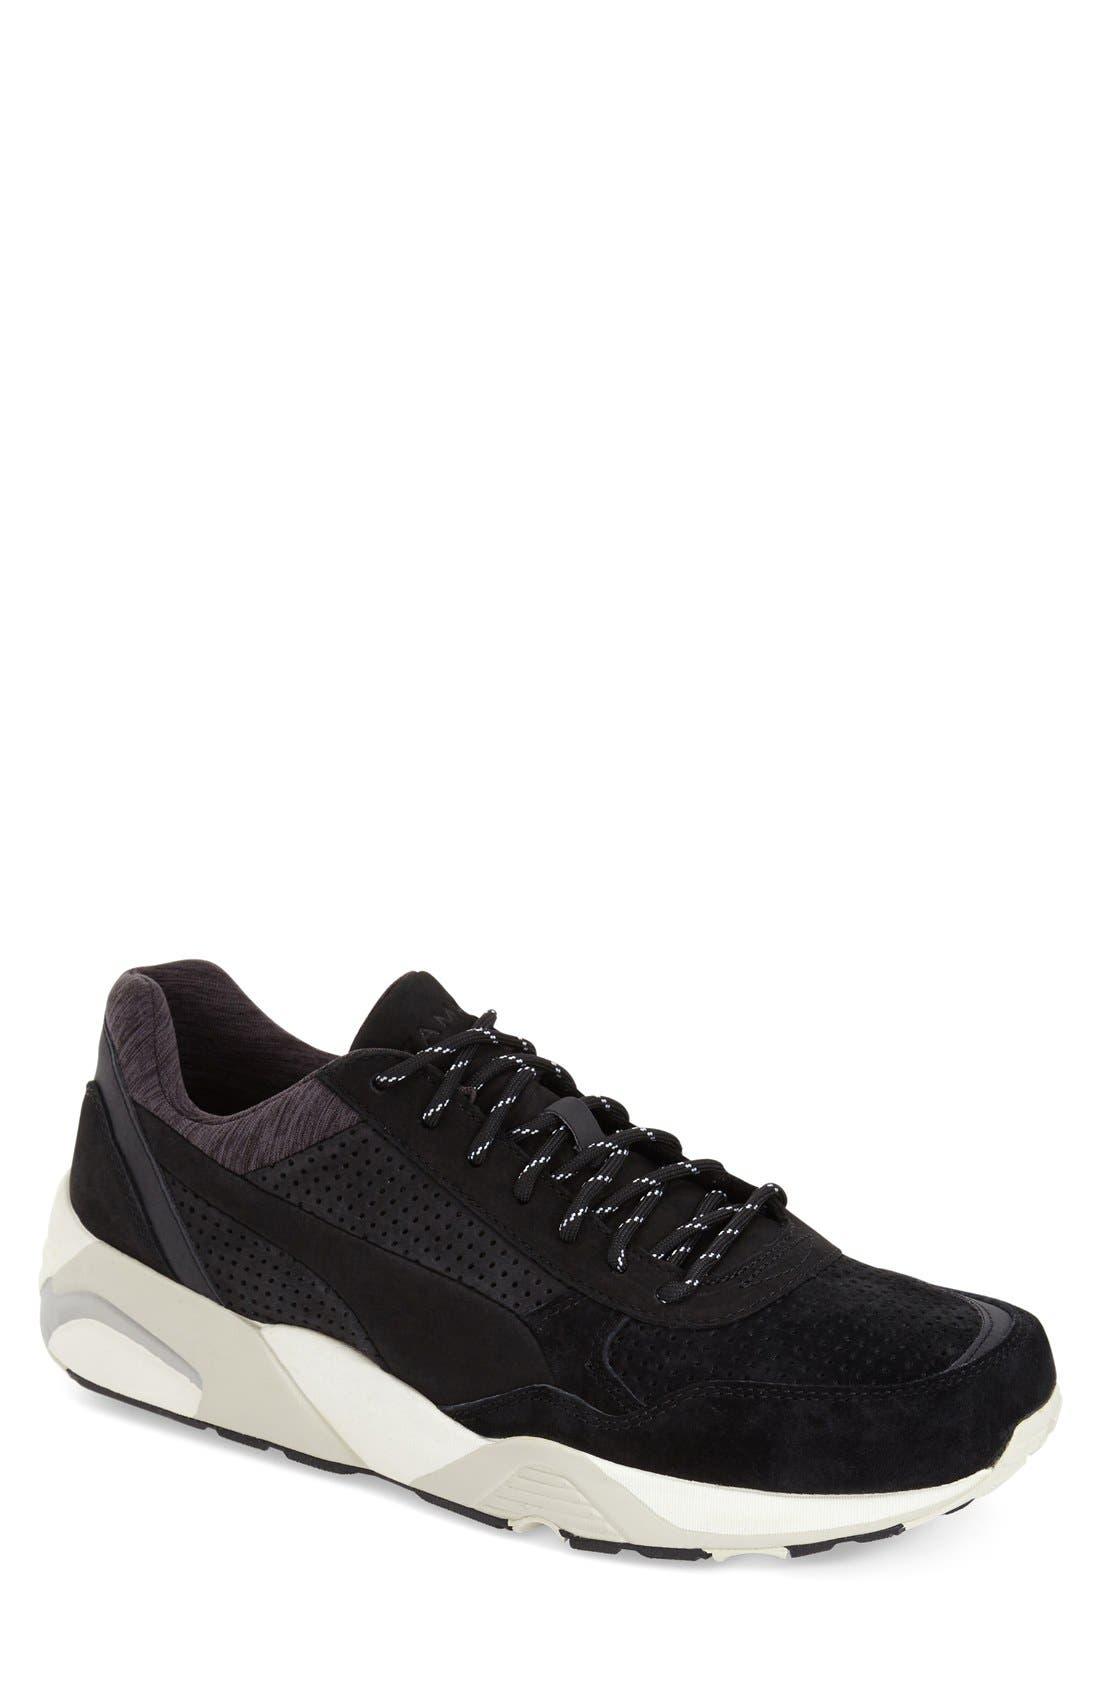 'R698 X STAMPD' Sneaker,                             Main thumbnail 1, color,                             001